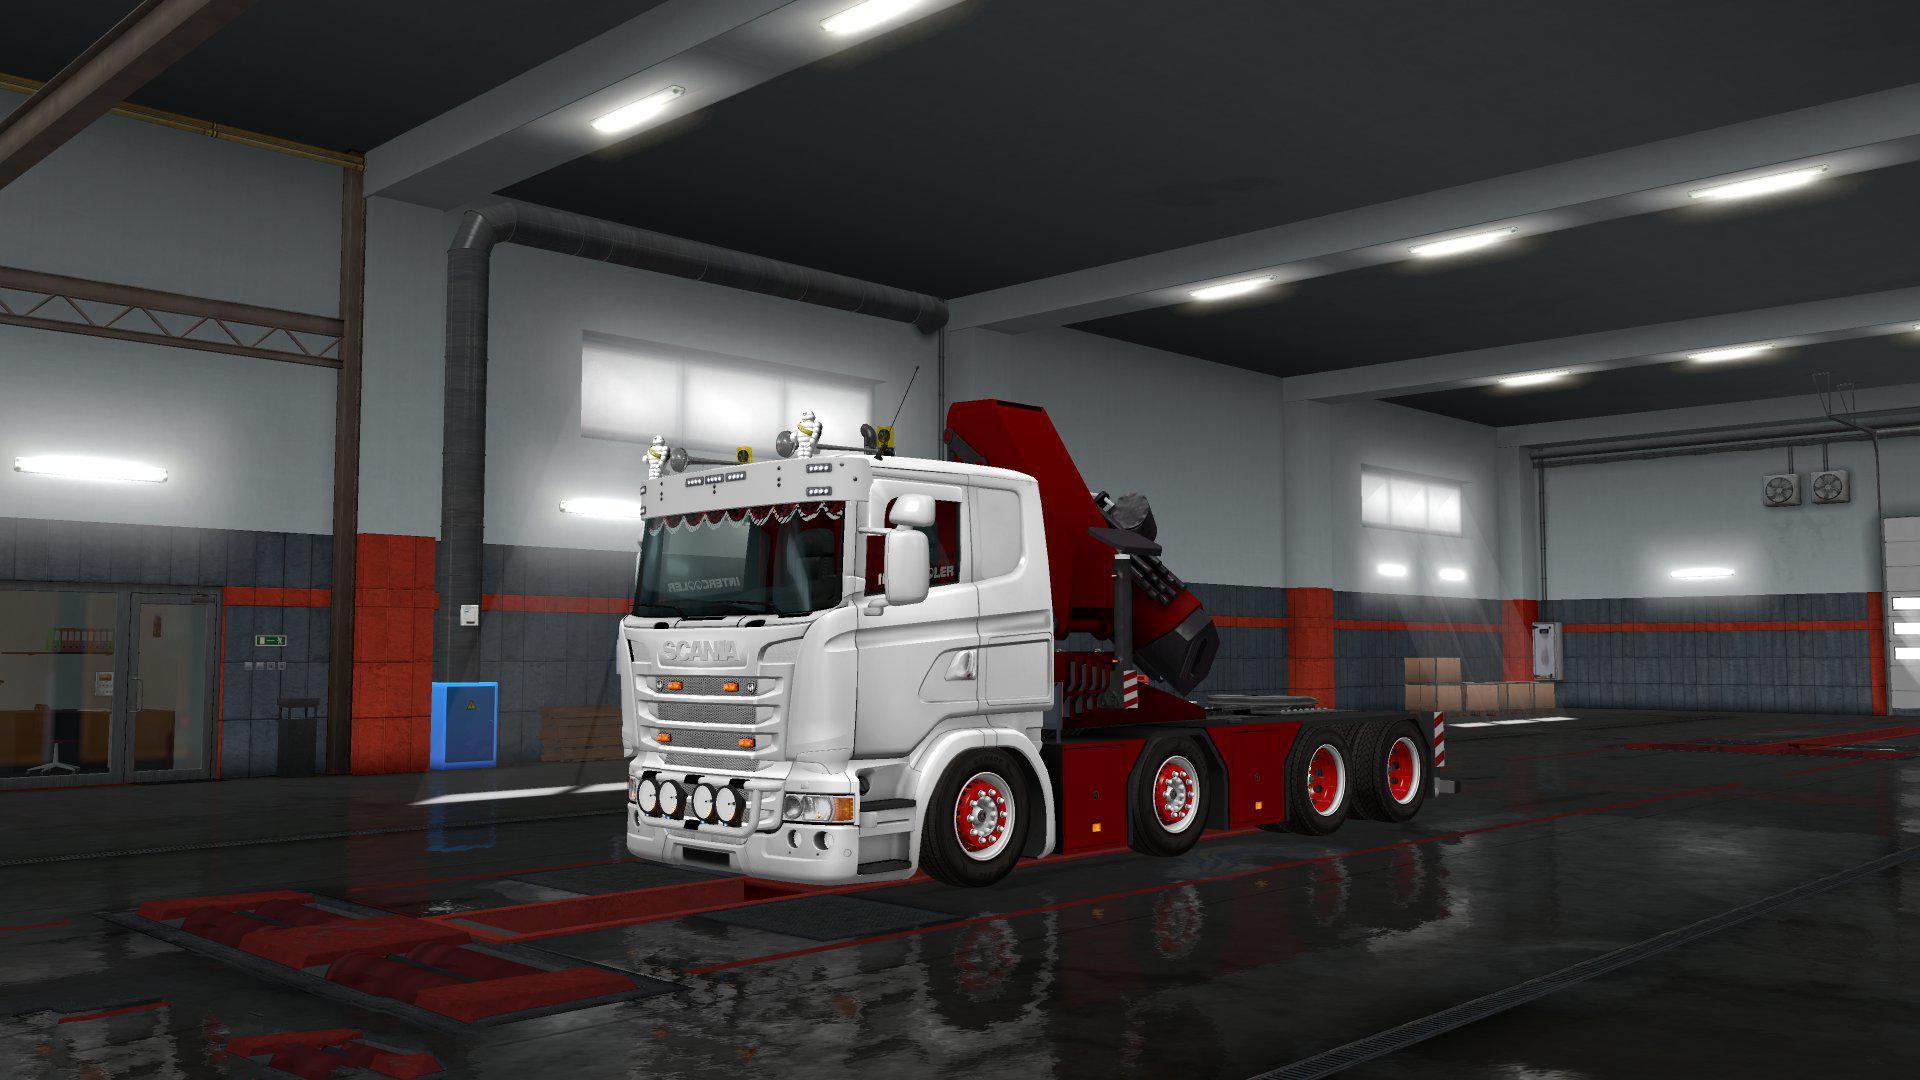 ETS2 - Scania Rjl Crane V2.0 (1.35.X)